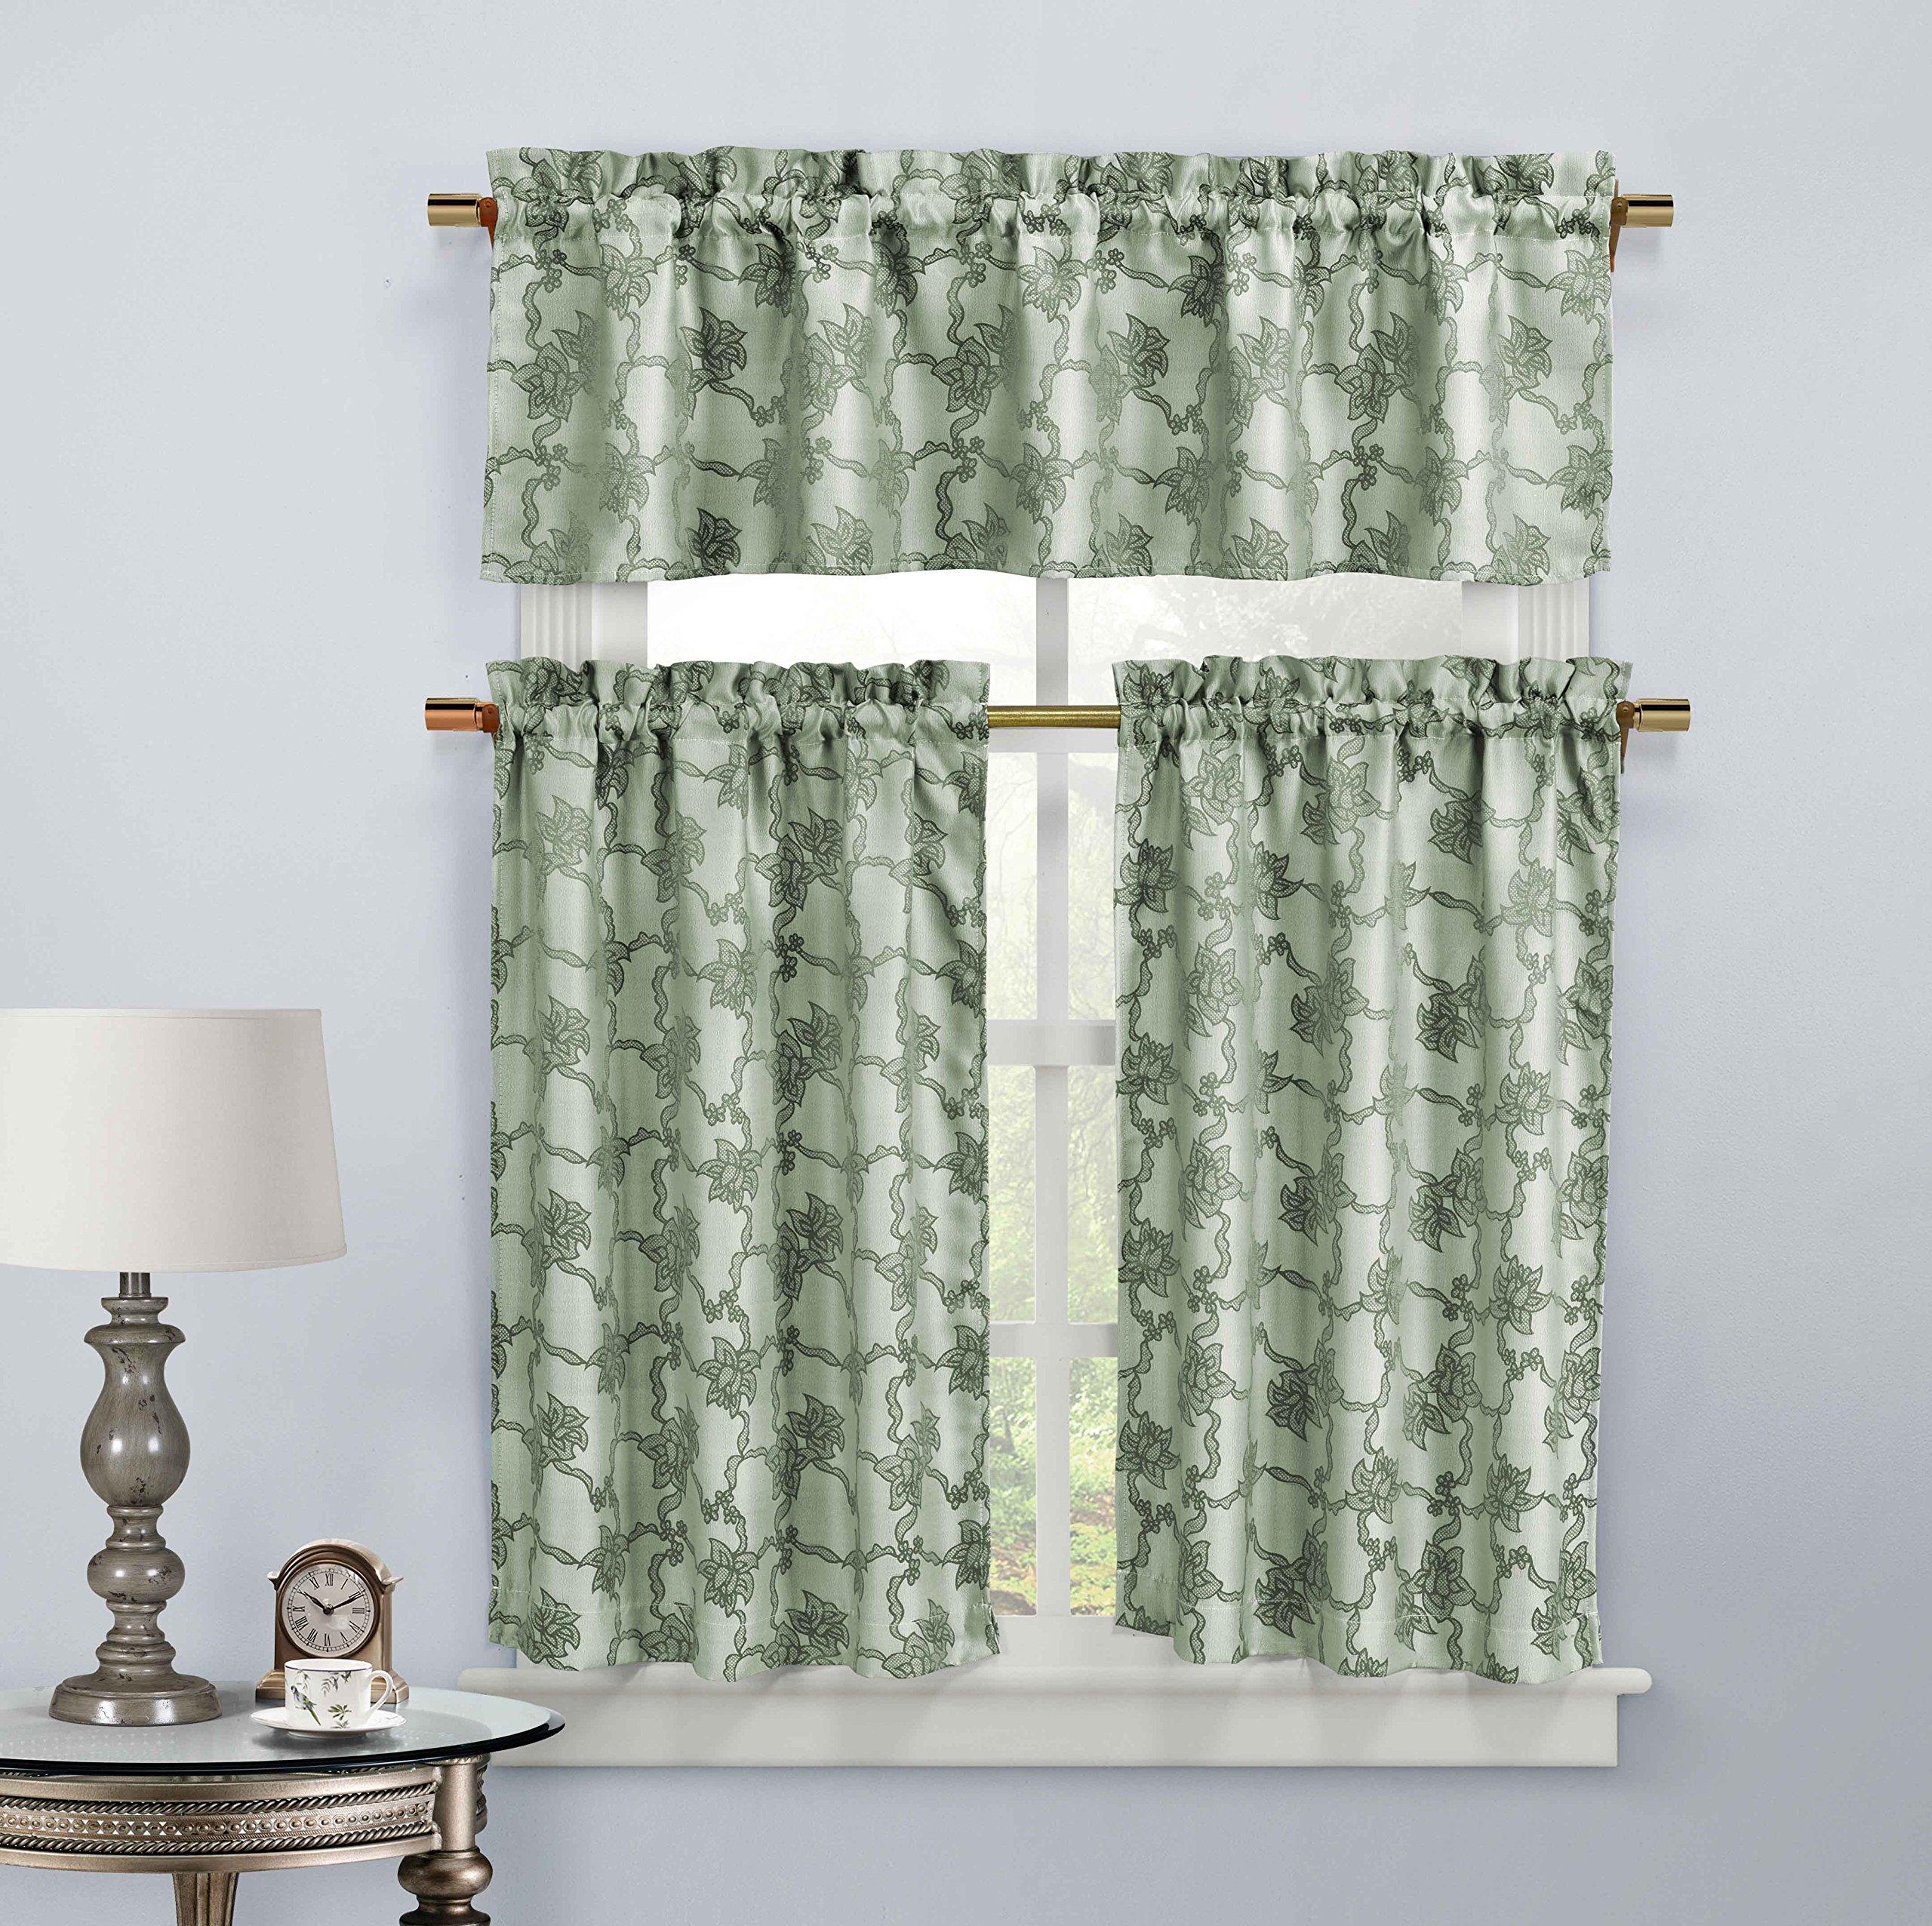 Spa Blue 3-Piece Jacquard Window Curtain Set: Boranical Vine Design, 2 Tiers, 1 Valance